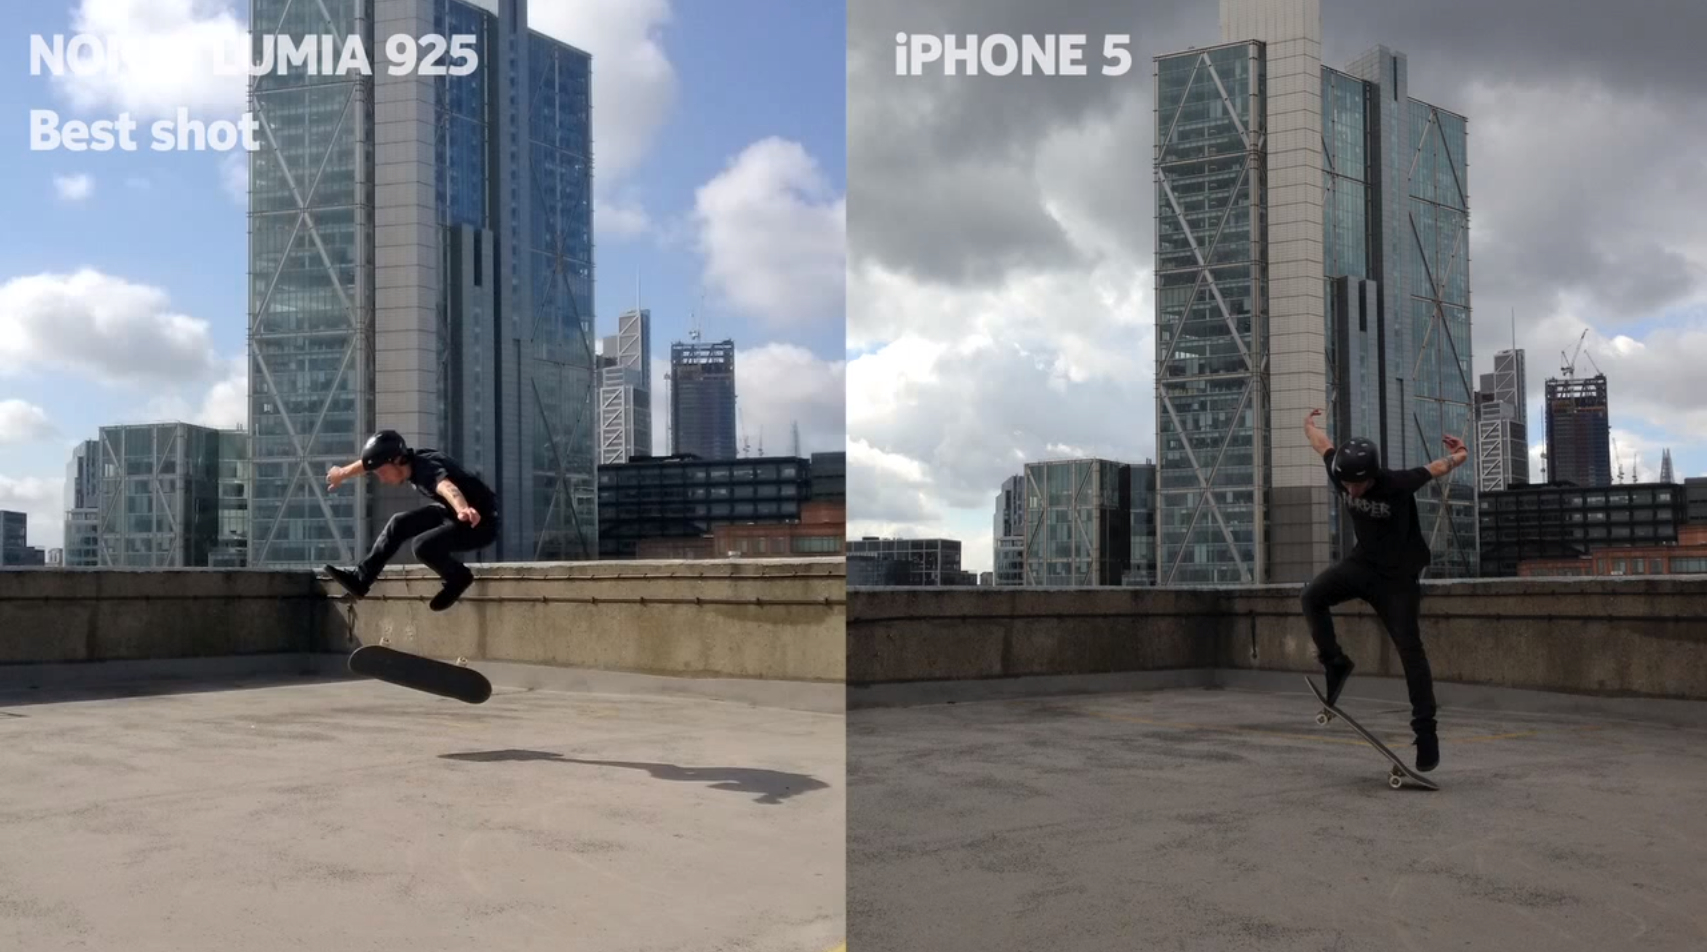 Comercial da Nokia - Lumia 925 vs. iPhone 5